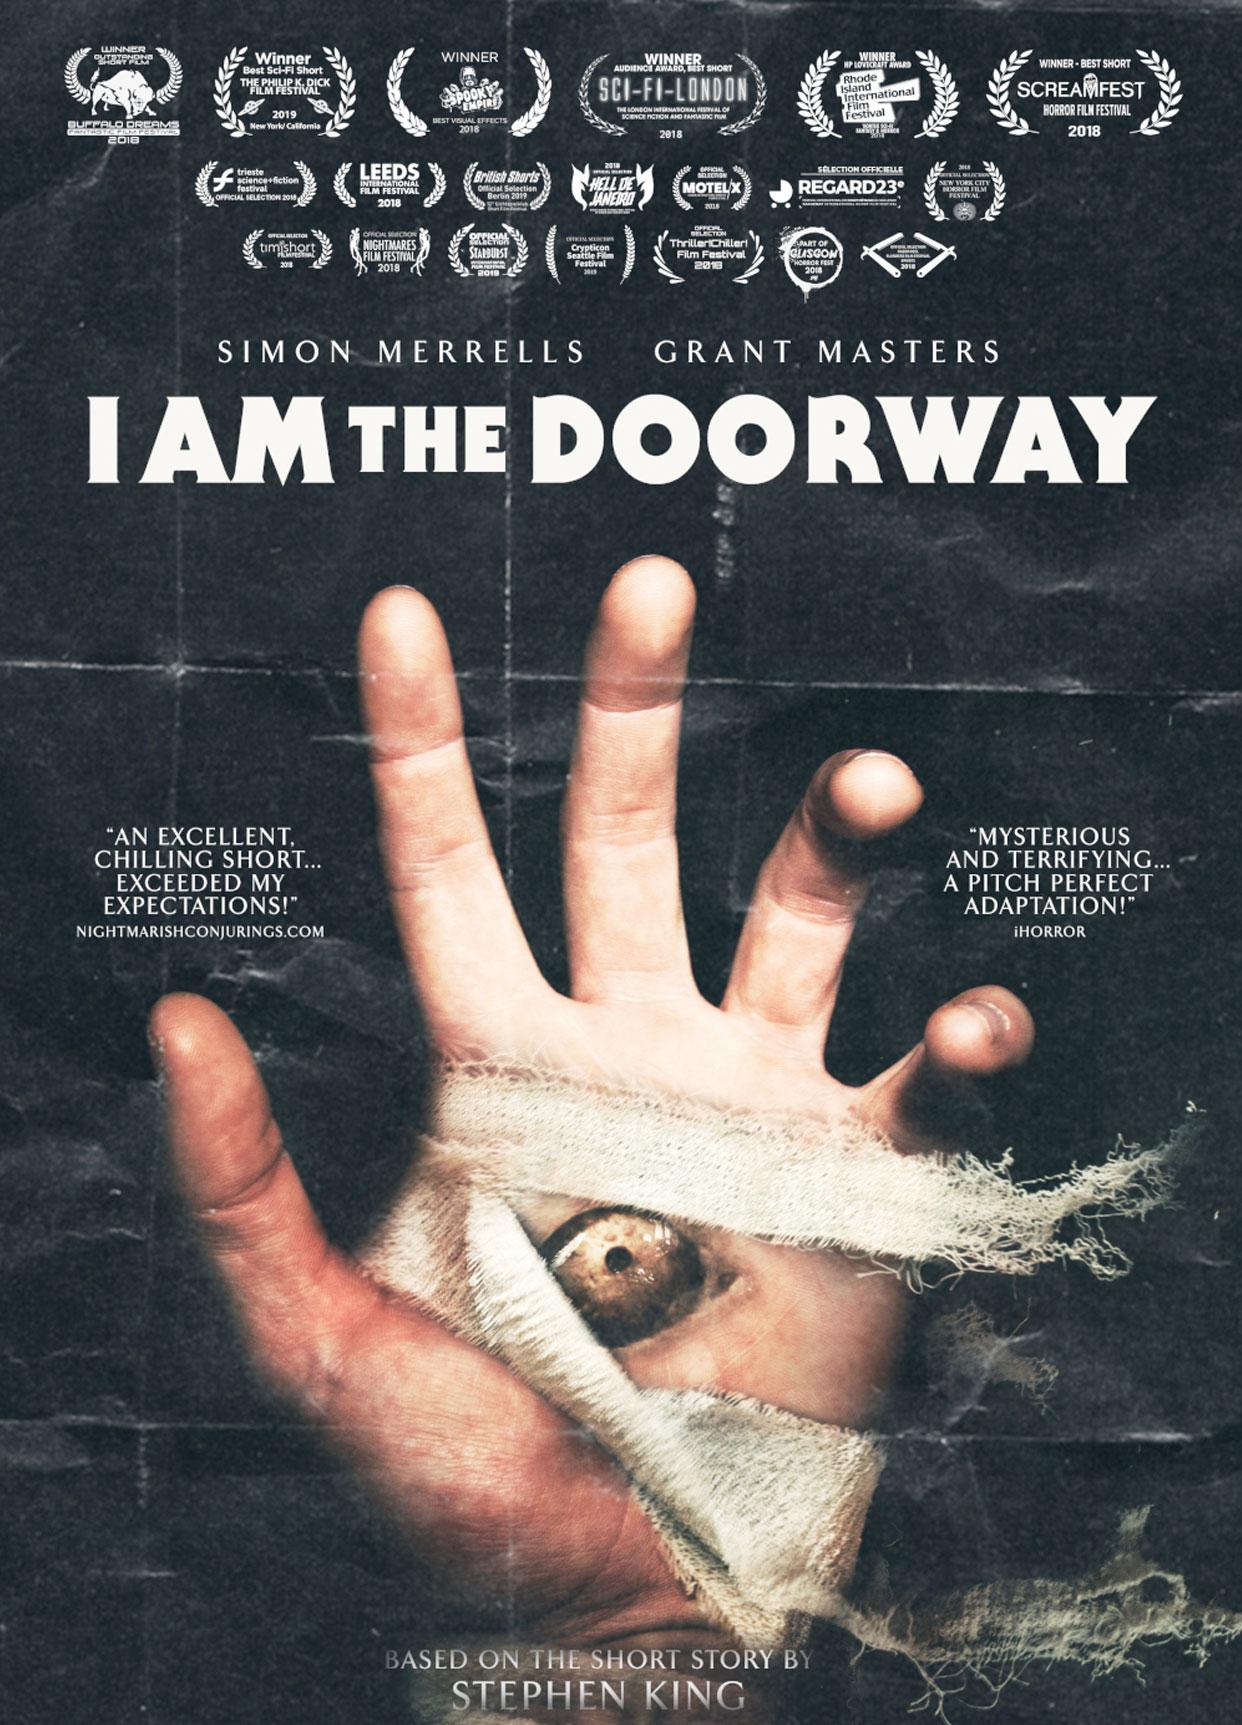 I-AM-THE-DOORWAY-Simon-Pearce